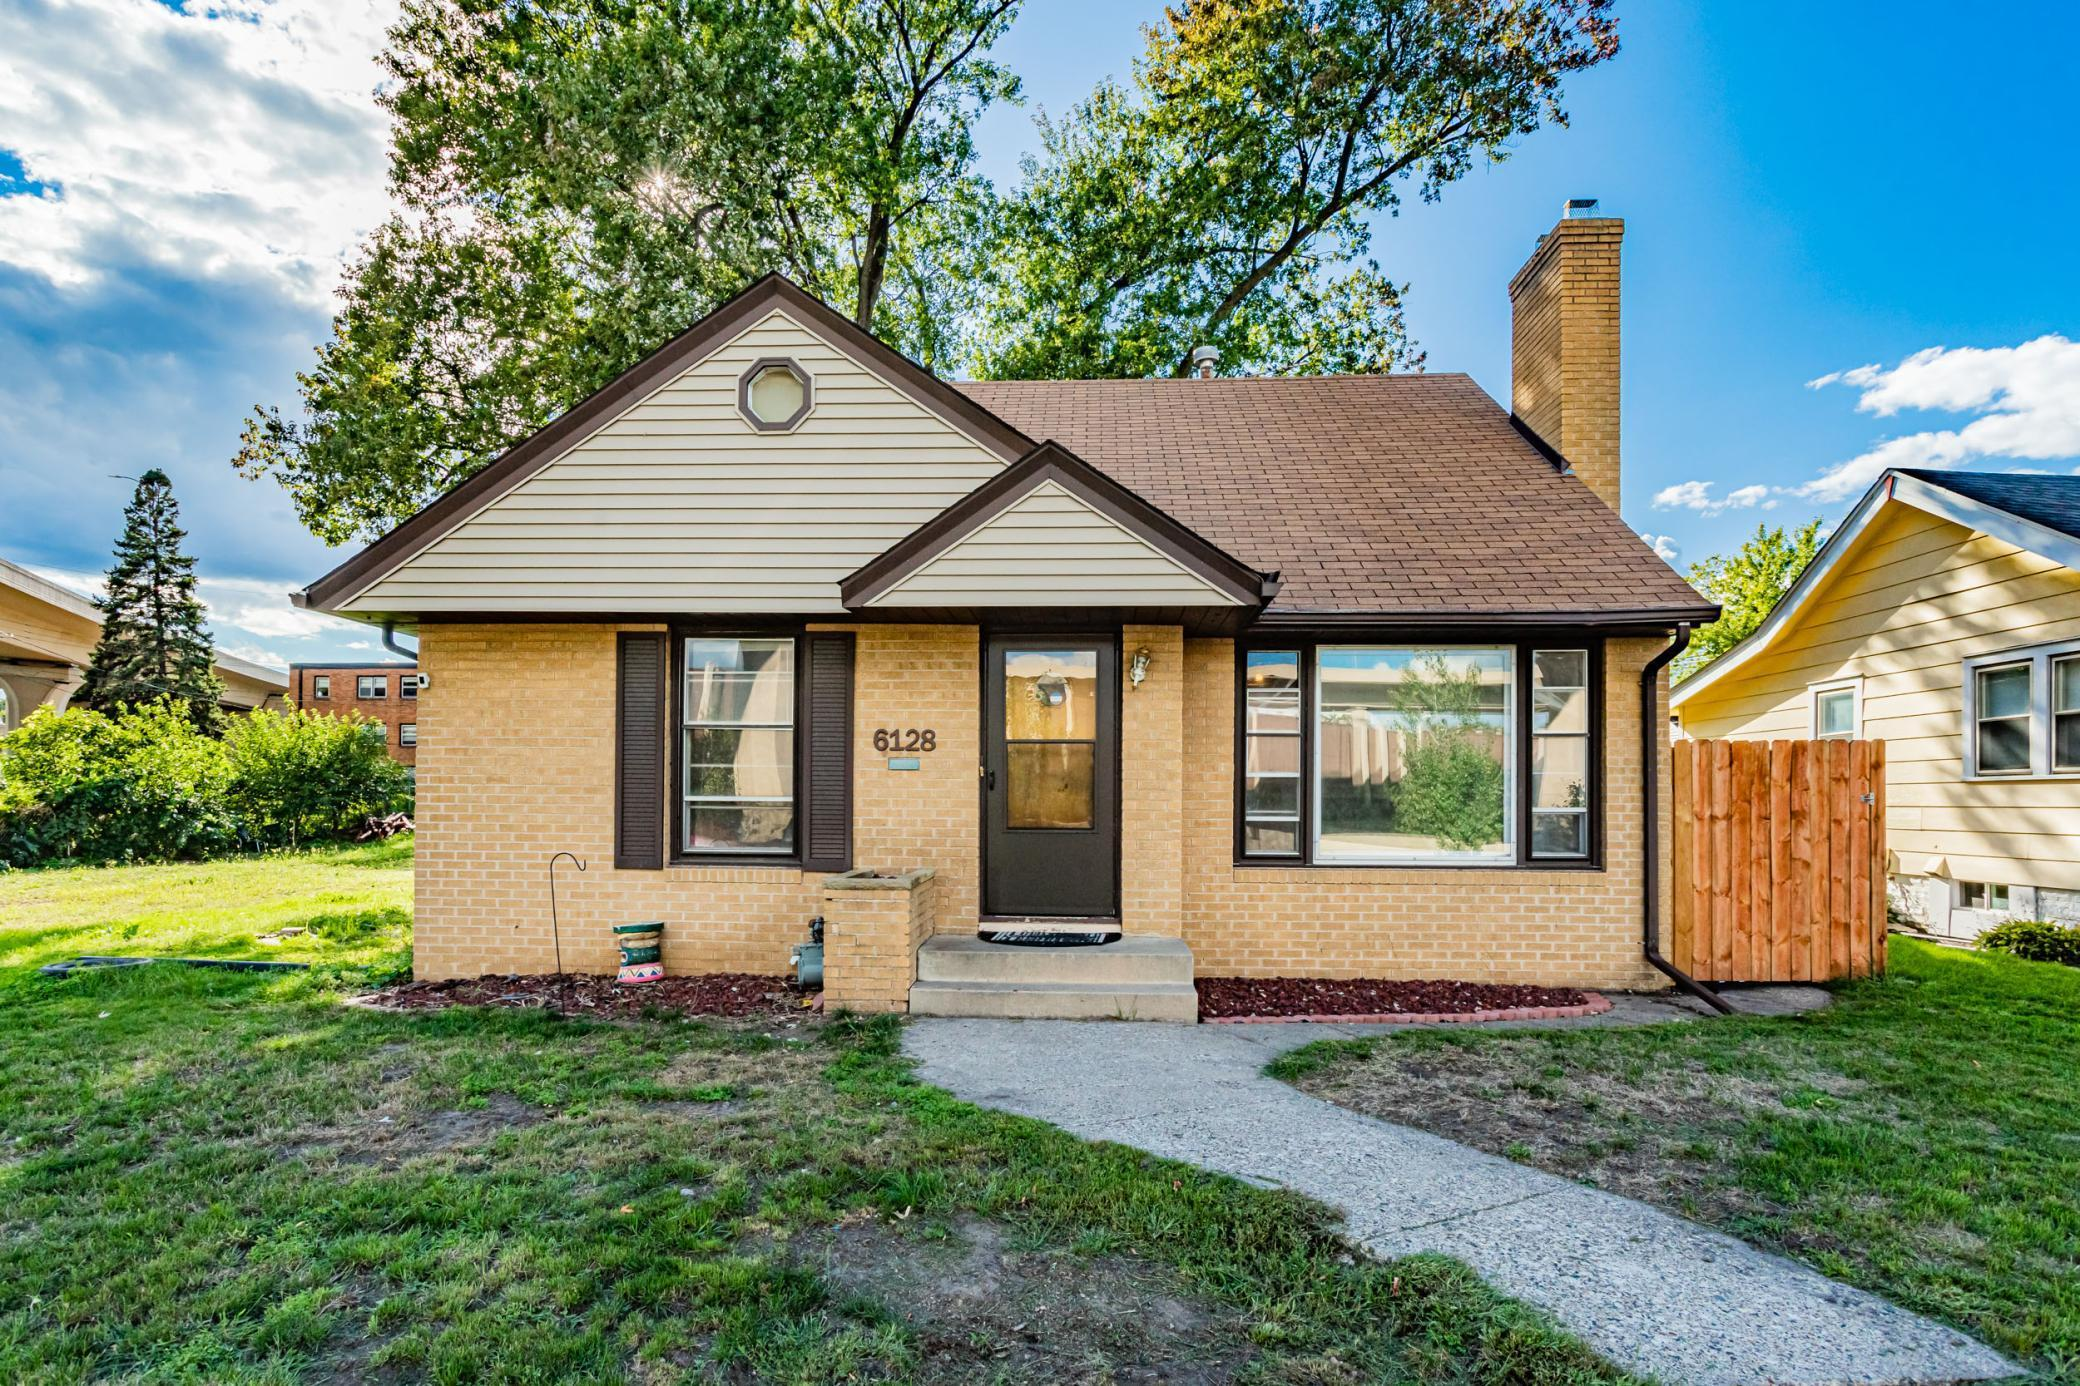 6128 1st Avenue Property Photo